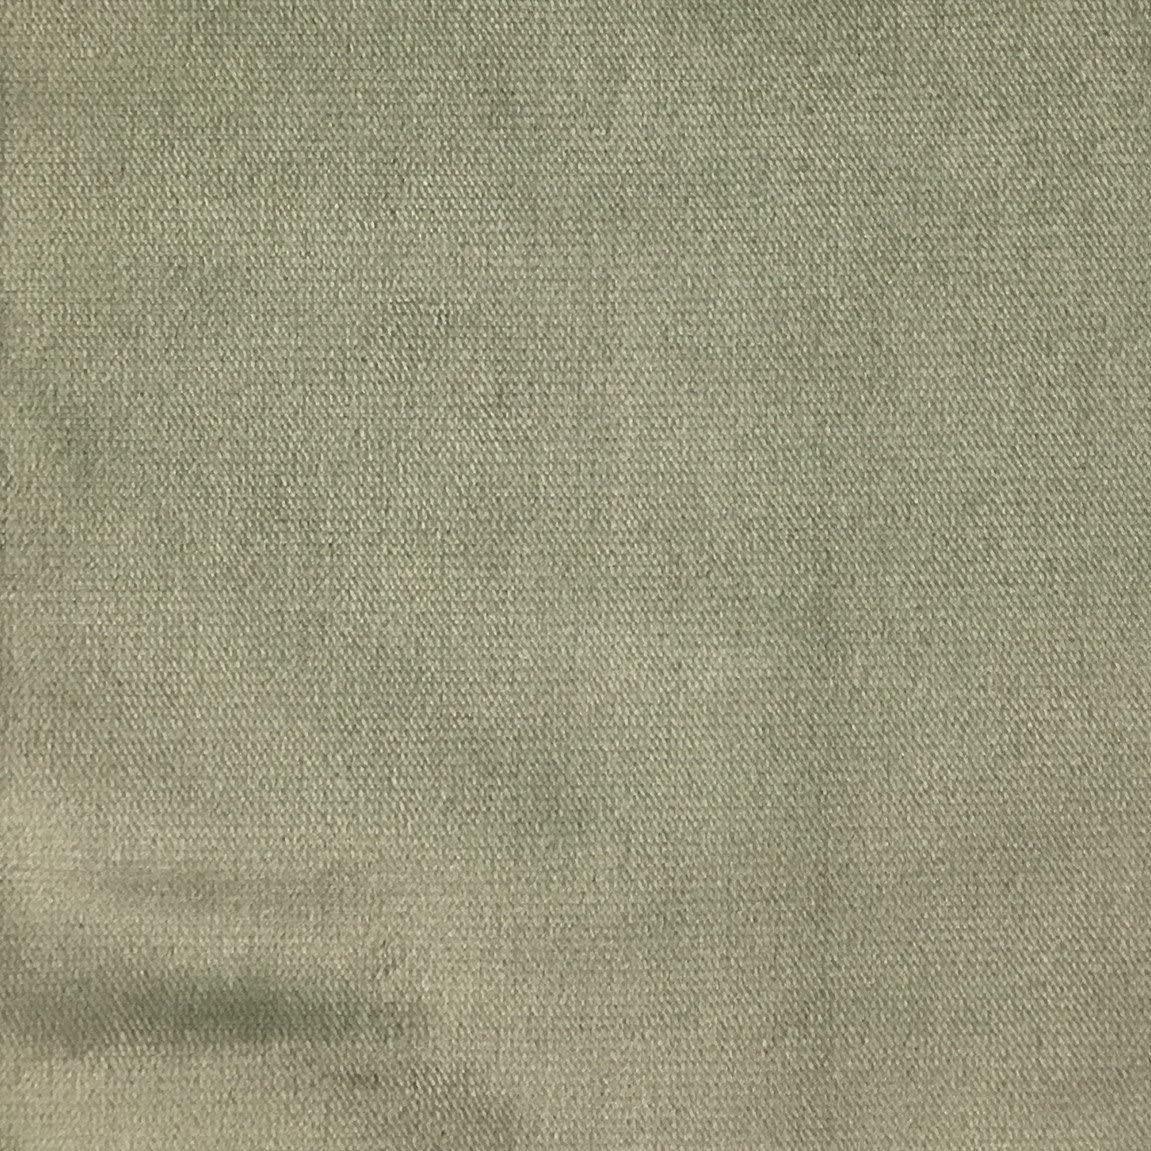 Byron - Premium Plush Sateen Velvet Upholstery Fabric by The Yard